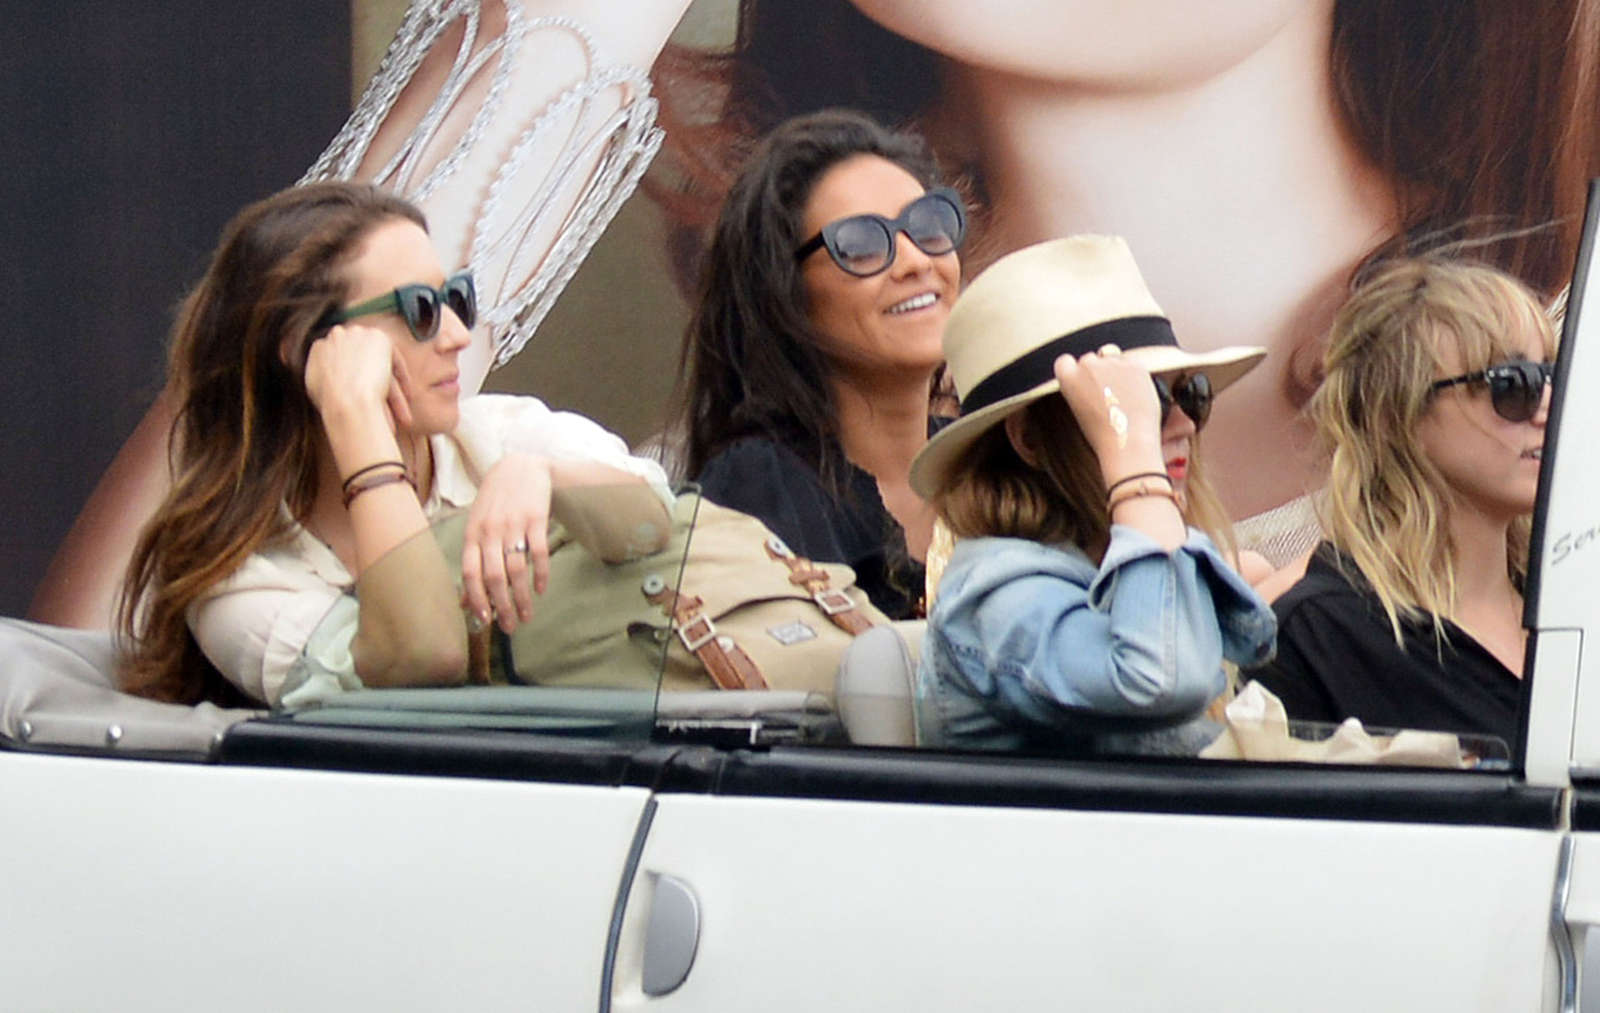 Ashley Benson 2016 : Ashley Benson, Shay Mitchell and Troian Bellisario on a boat in Capri -38